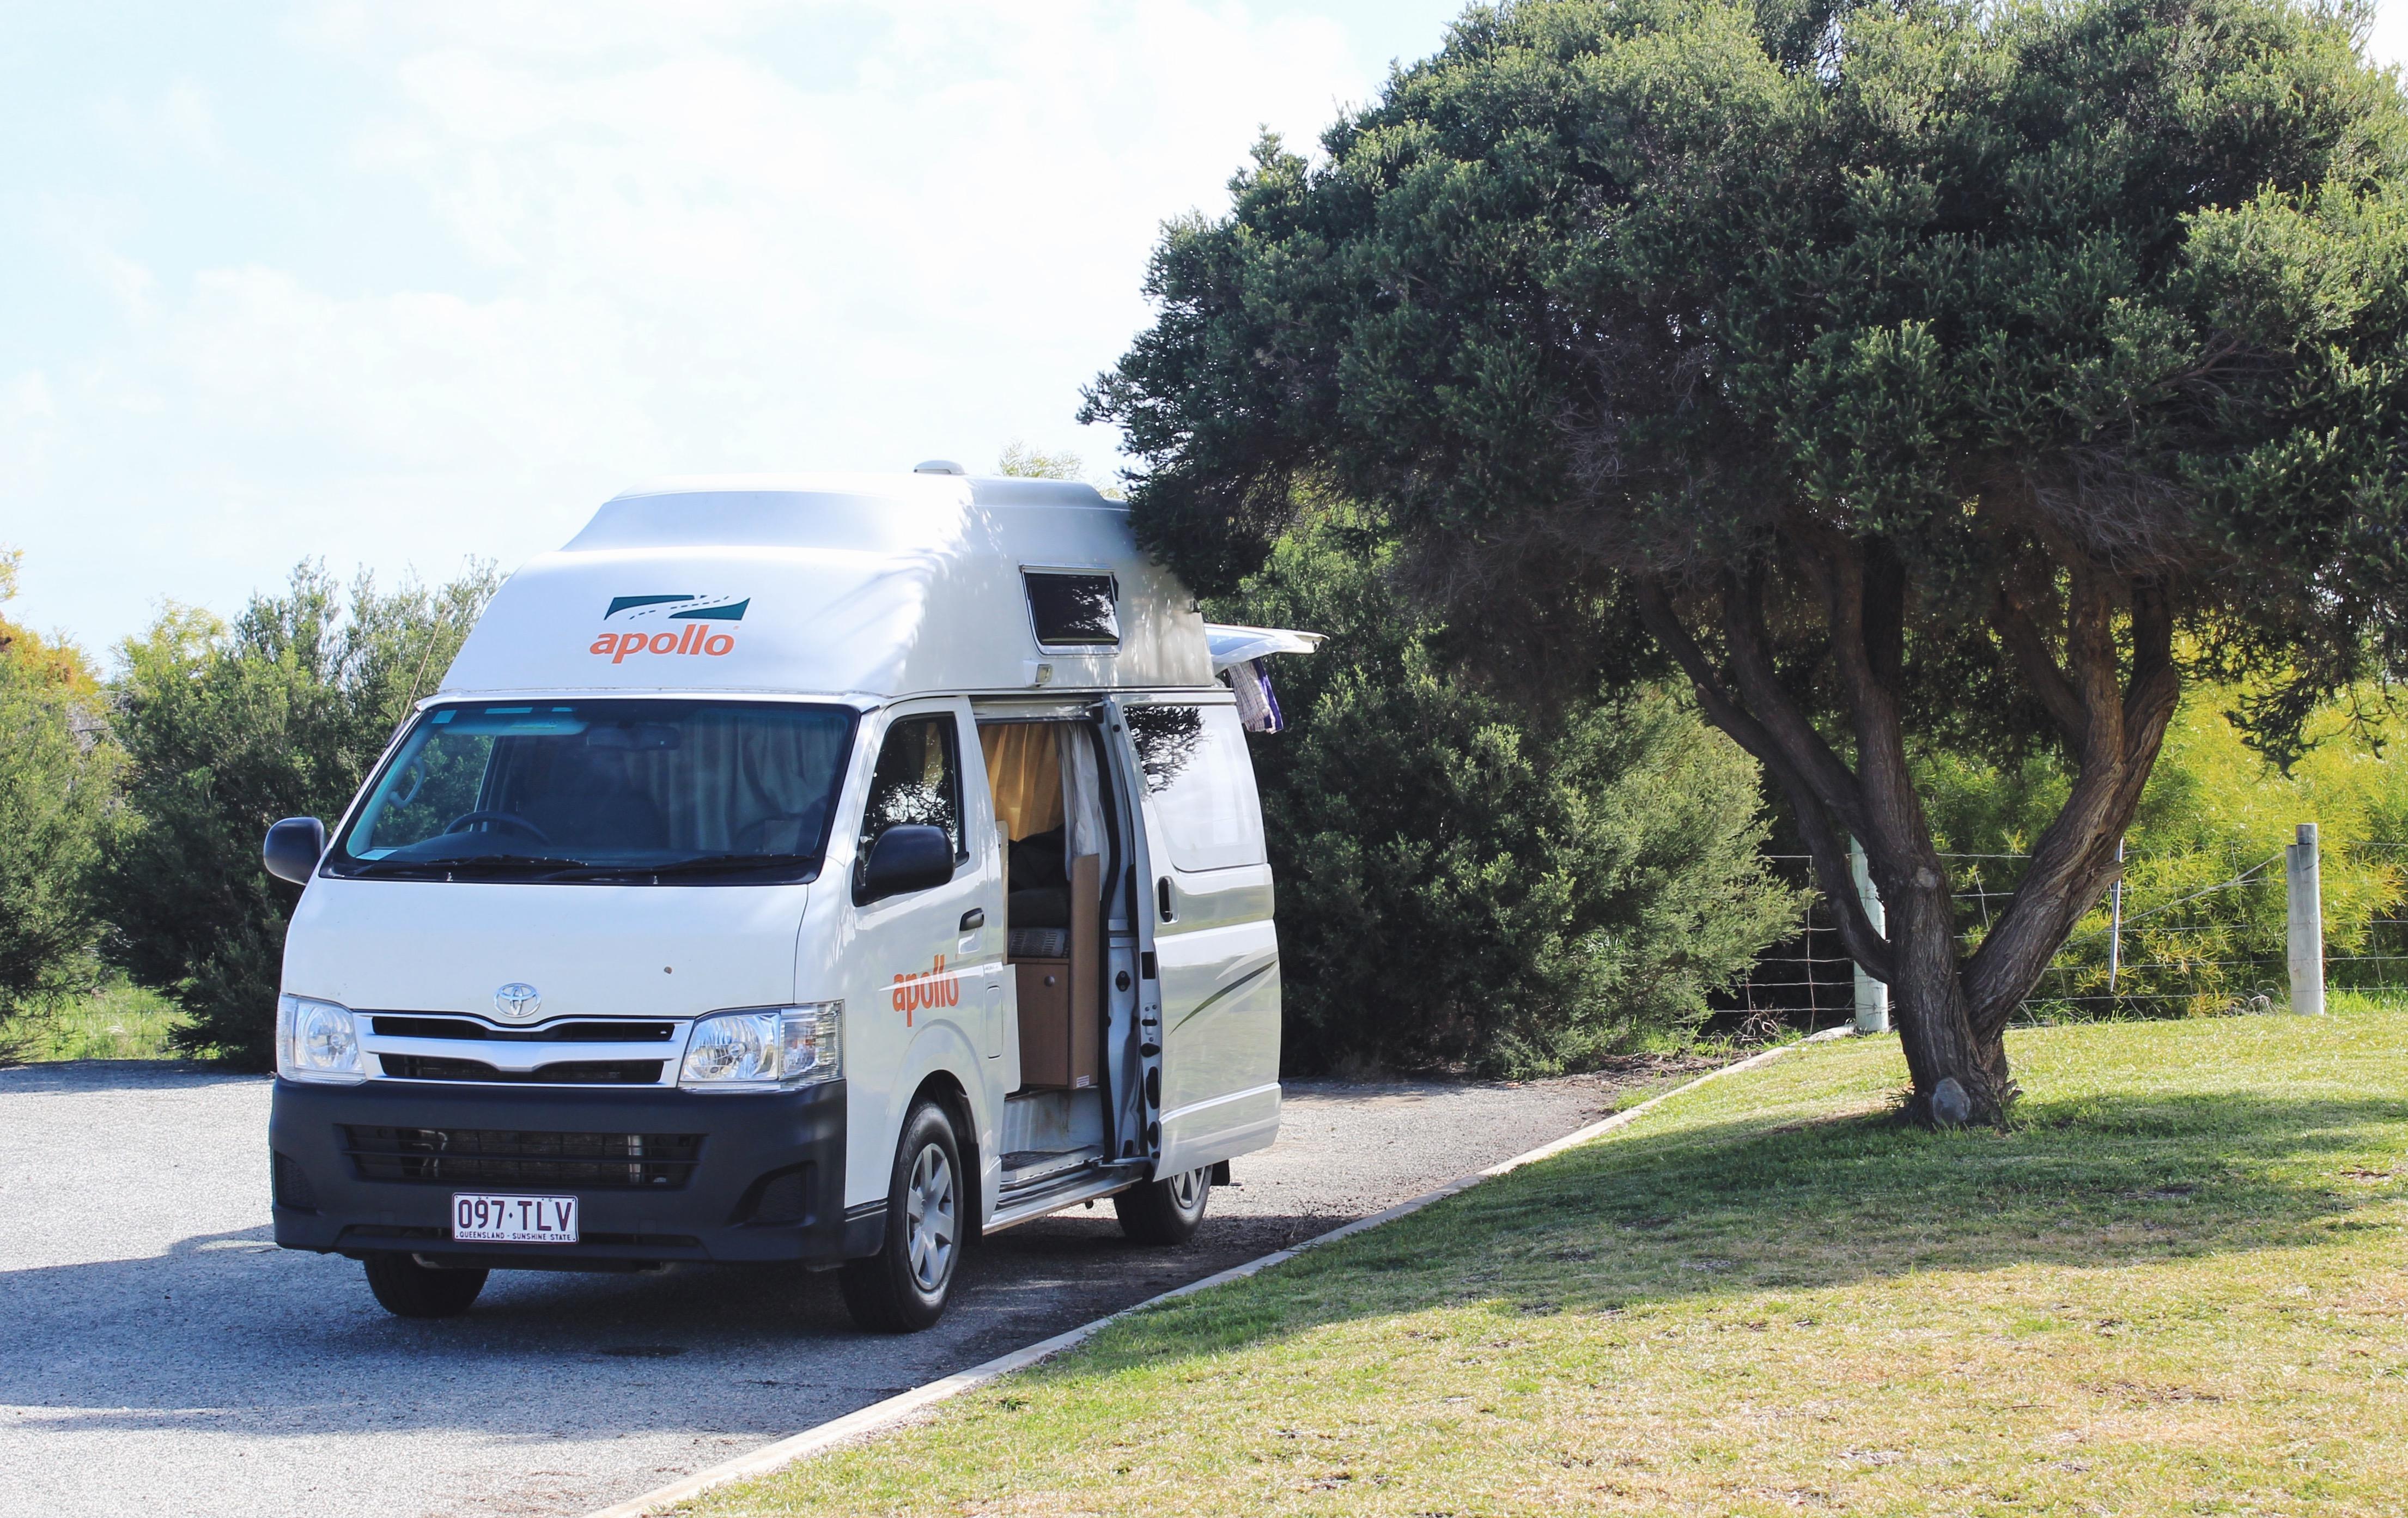 Voyages-et-compagnie.com - Blog voyage | Apollo, Toyota Hiace Hi-Top